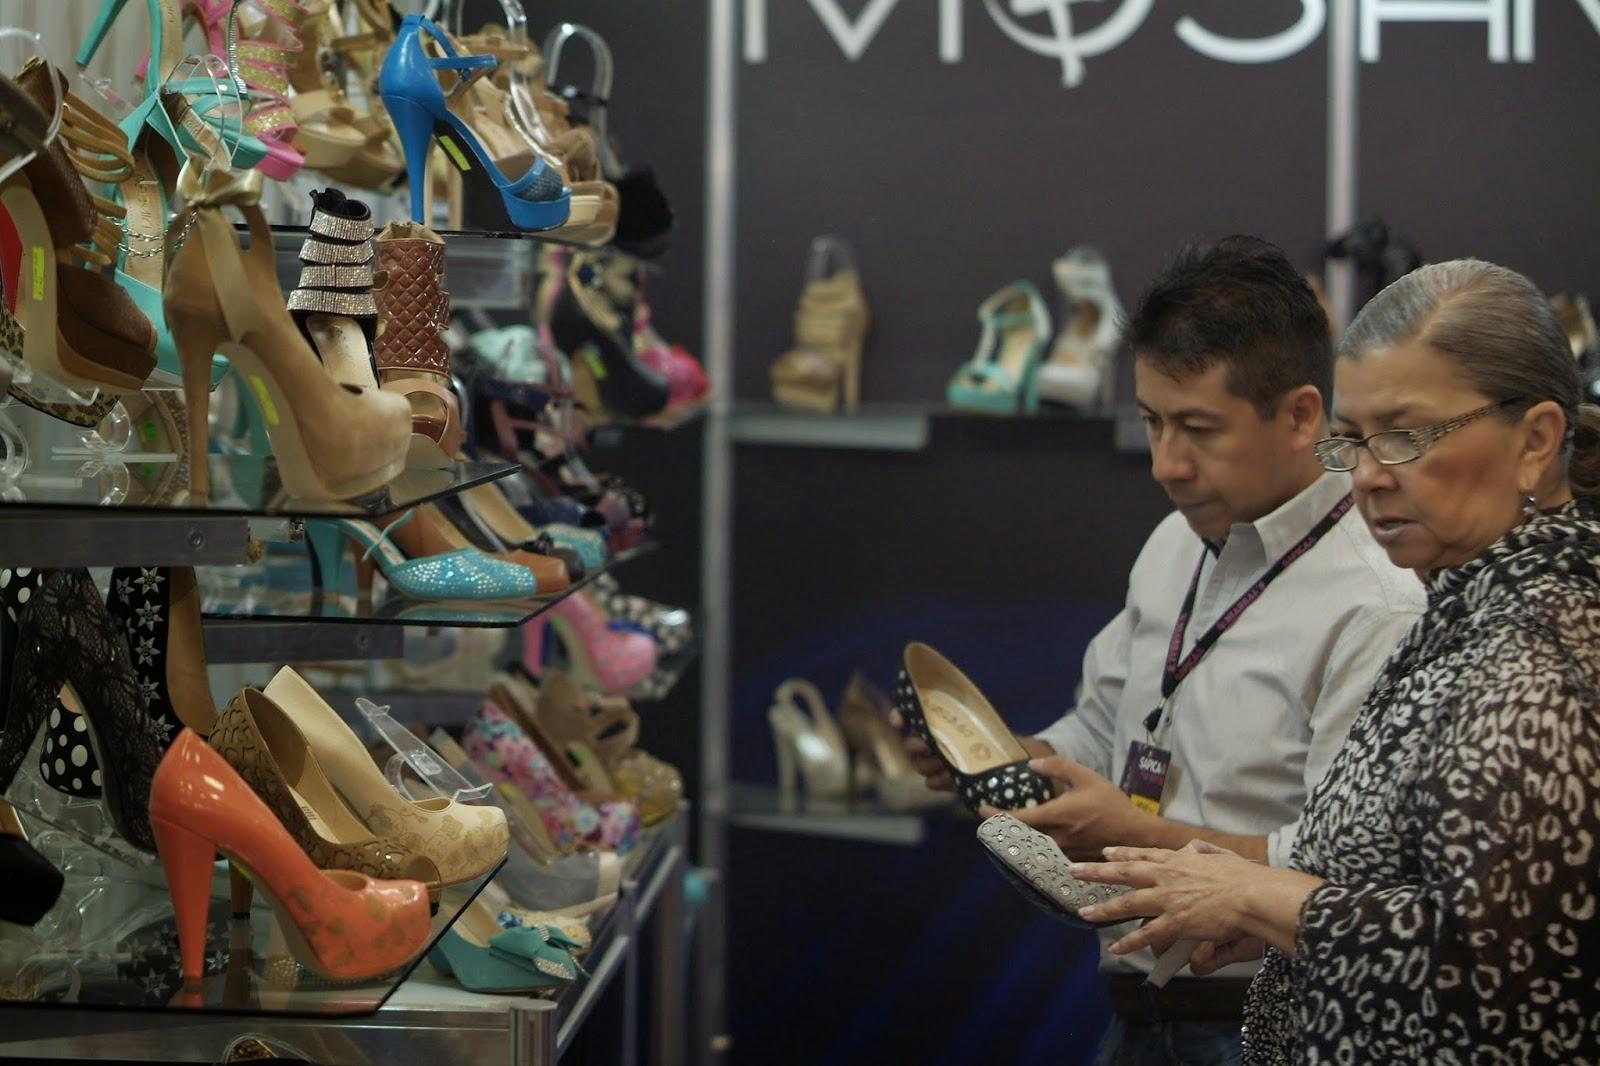 compradores, sapica, marzo 2014, poliforum, feria de calzado,